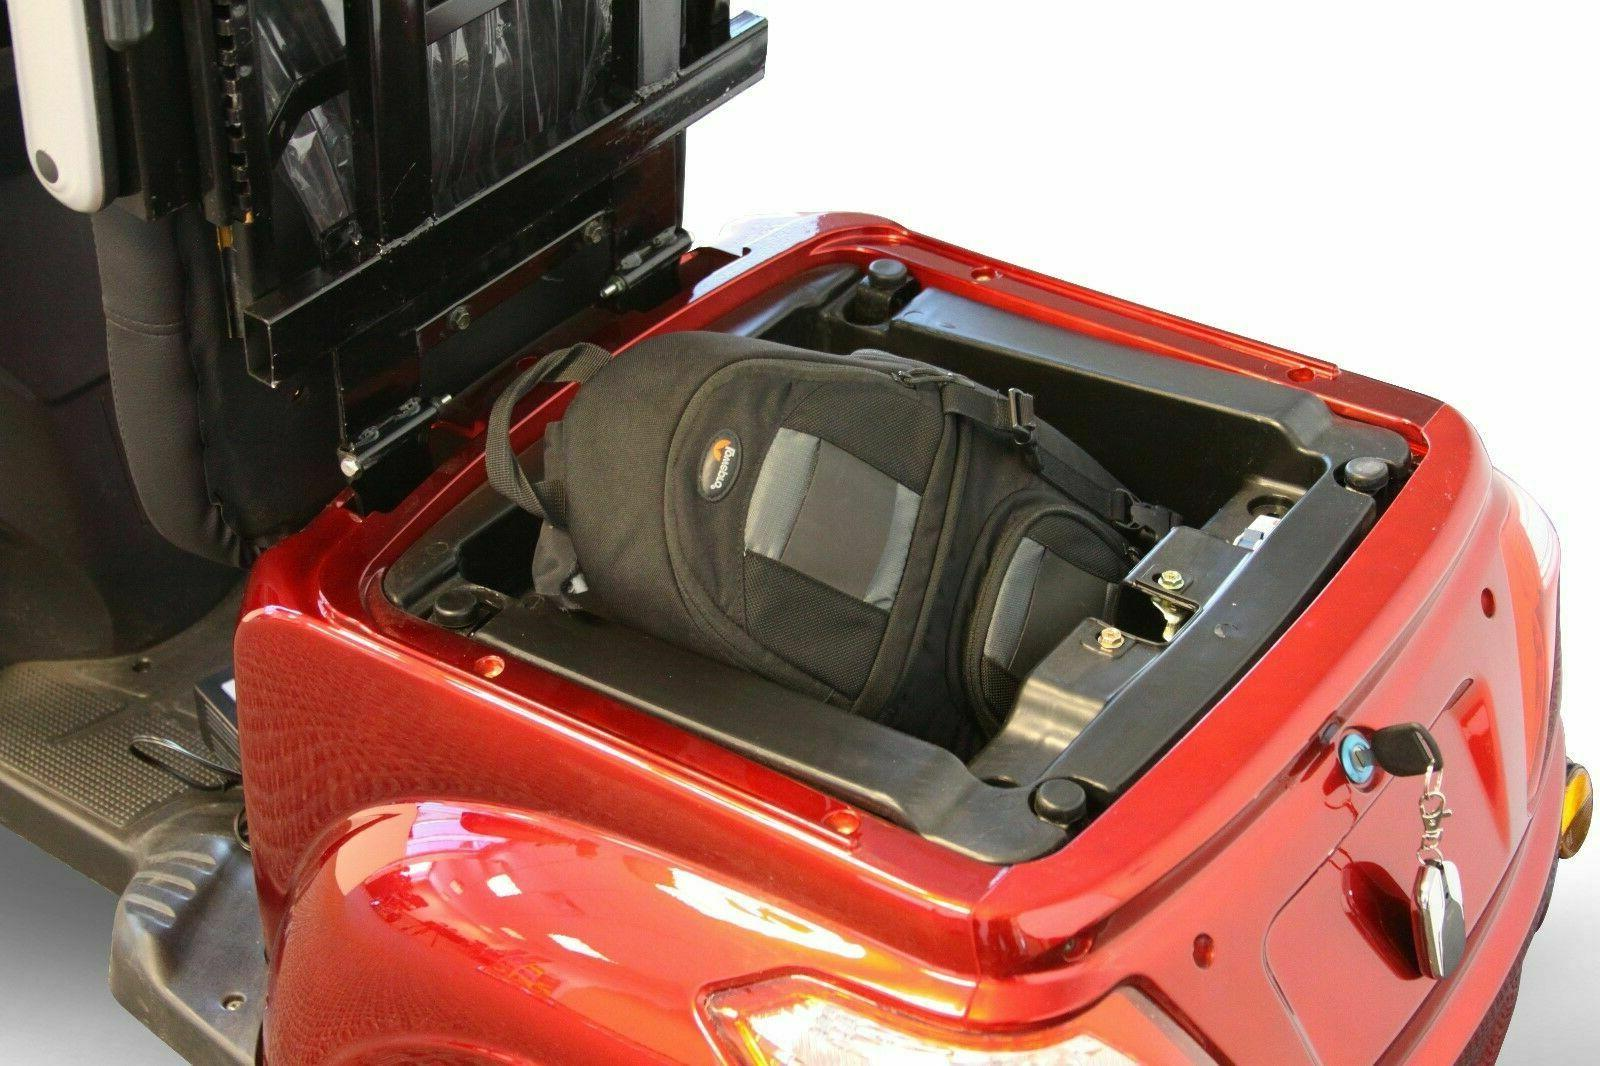 eWheels Electric Mobility - Heavy Duty 15mph - 43 Mile range